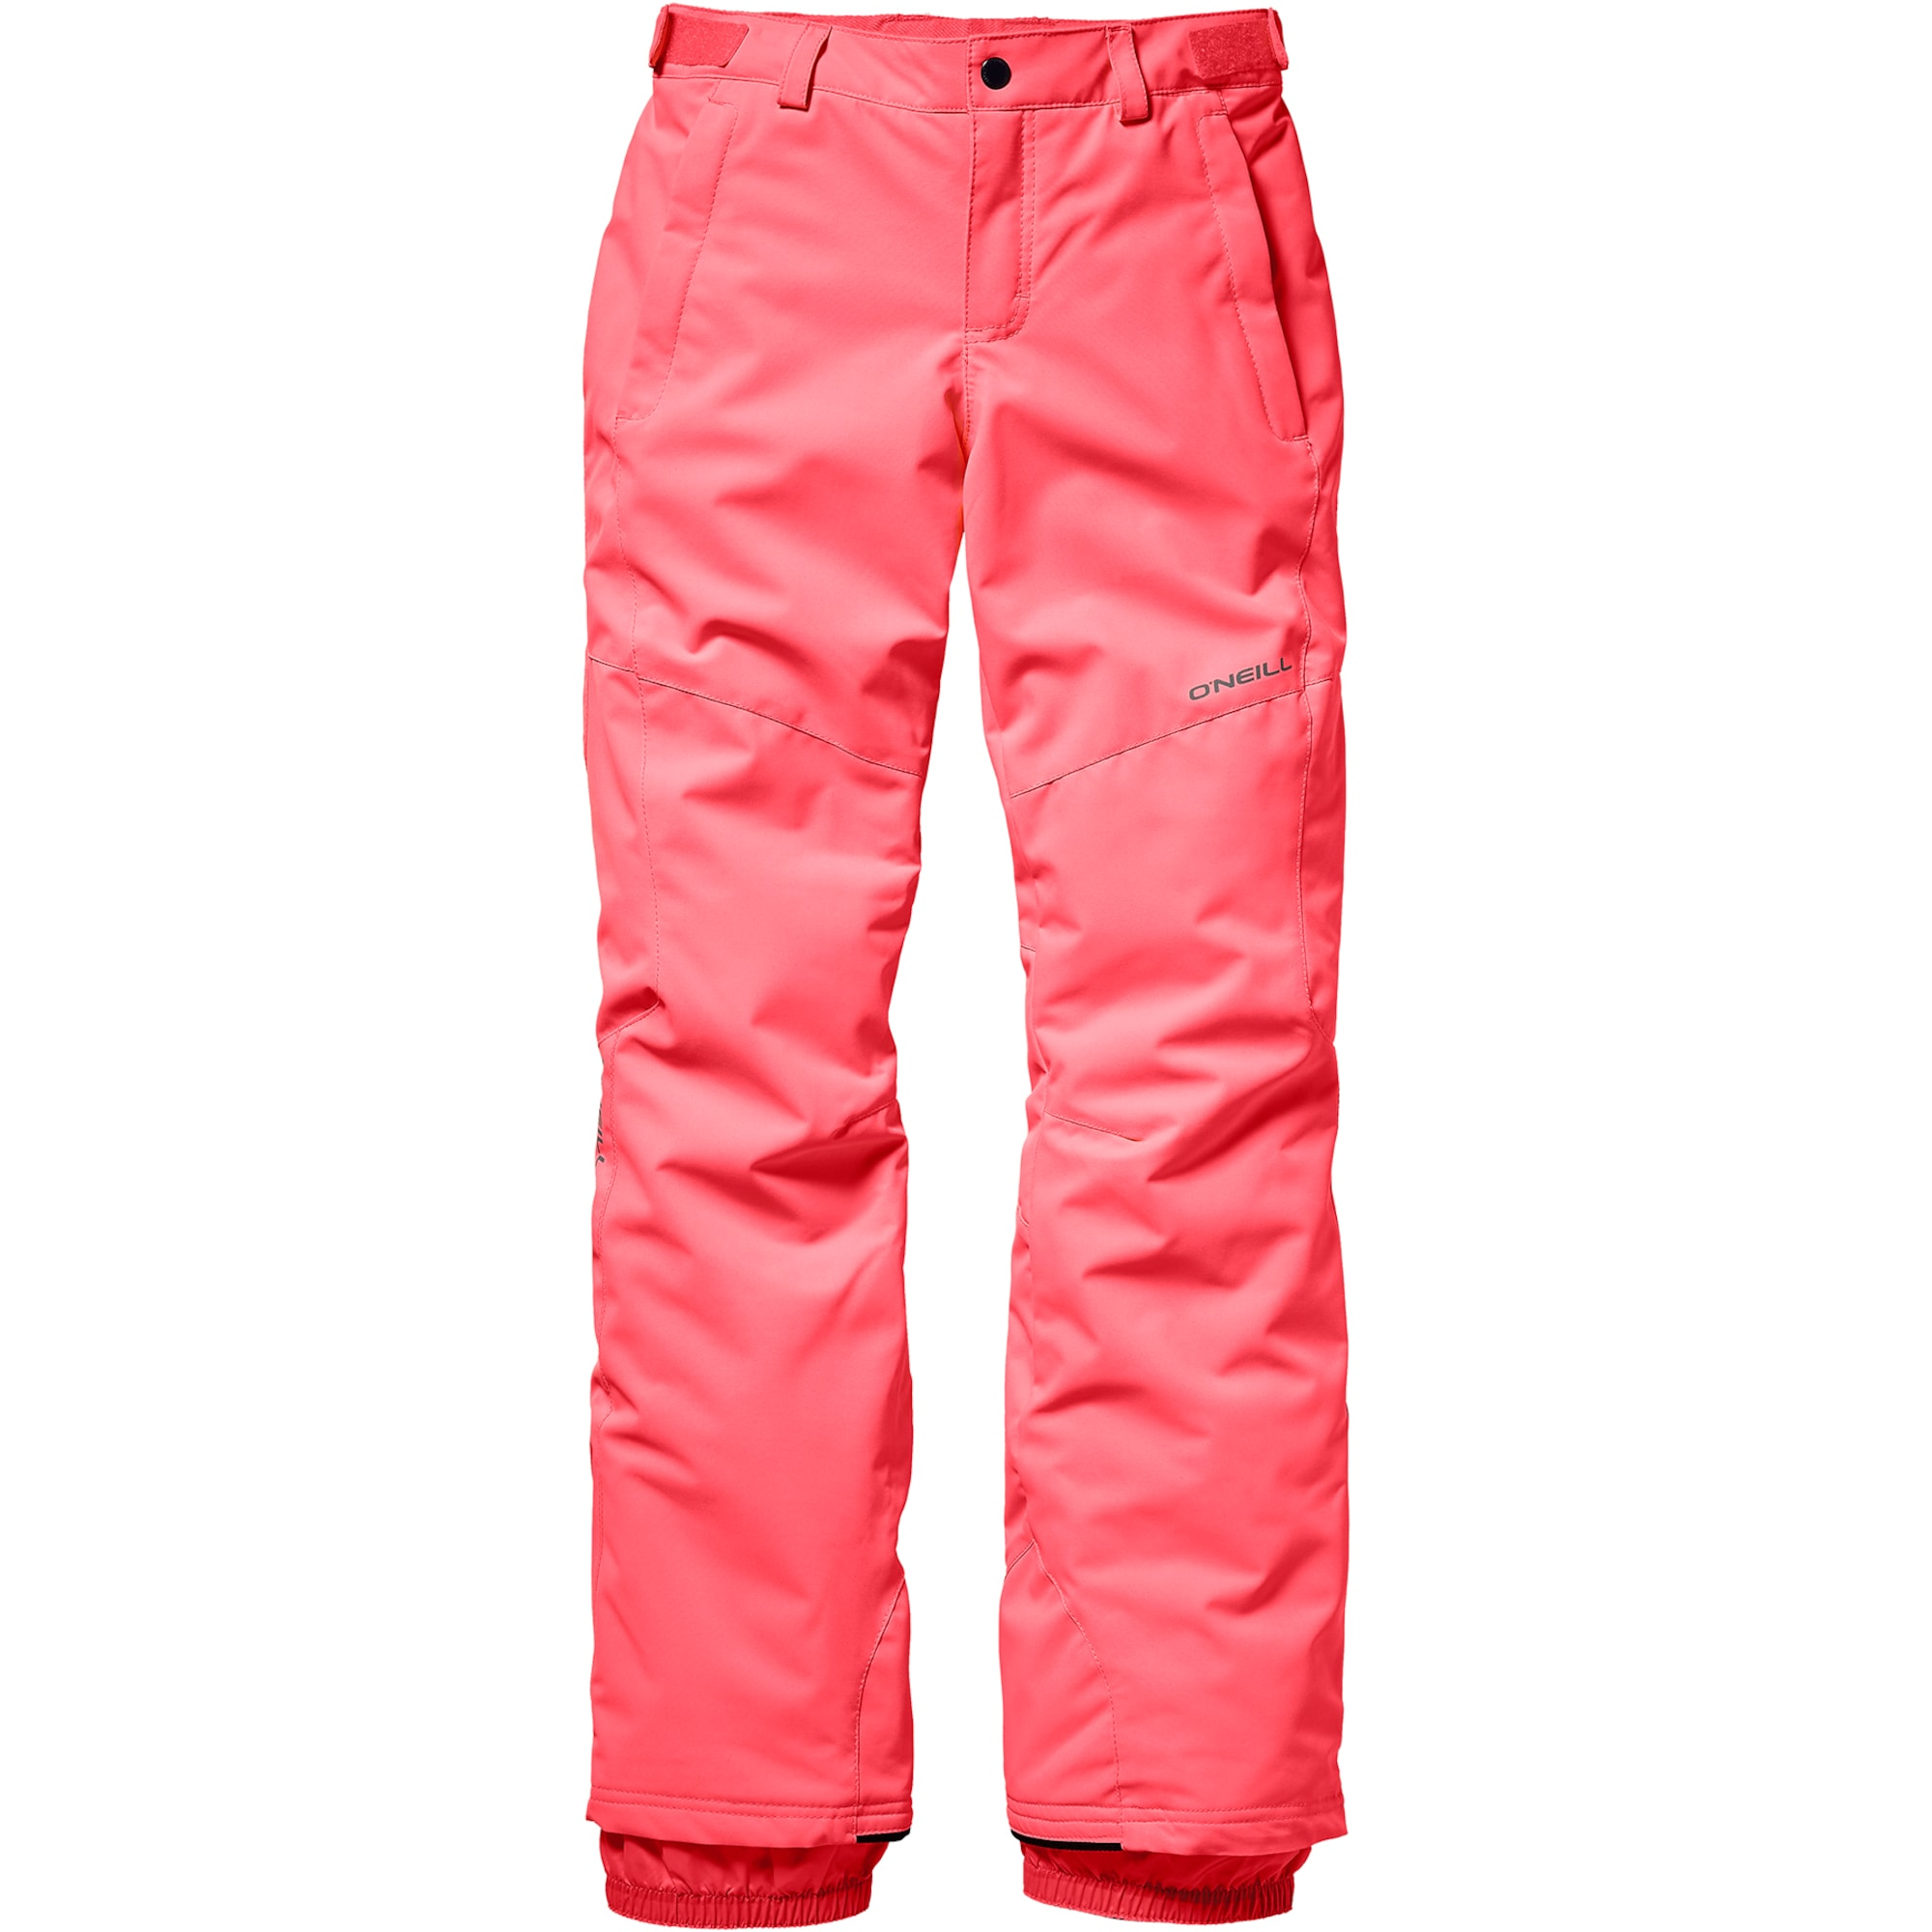 ONEILL Outdoorové kalhoty Pg Charm pink O'NEILL